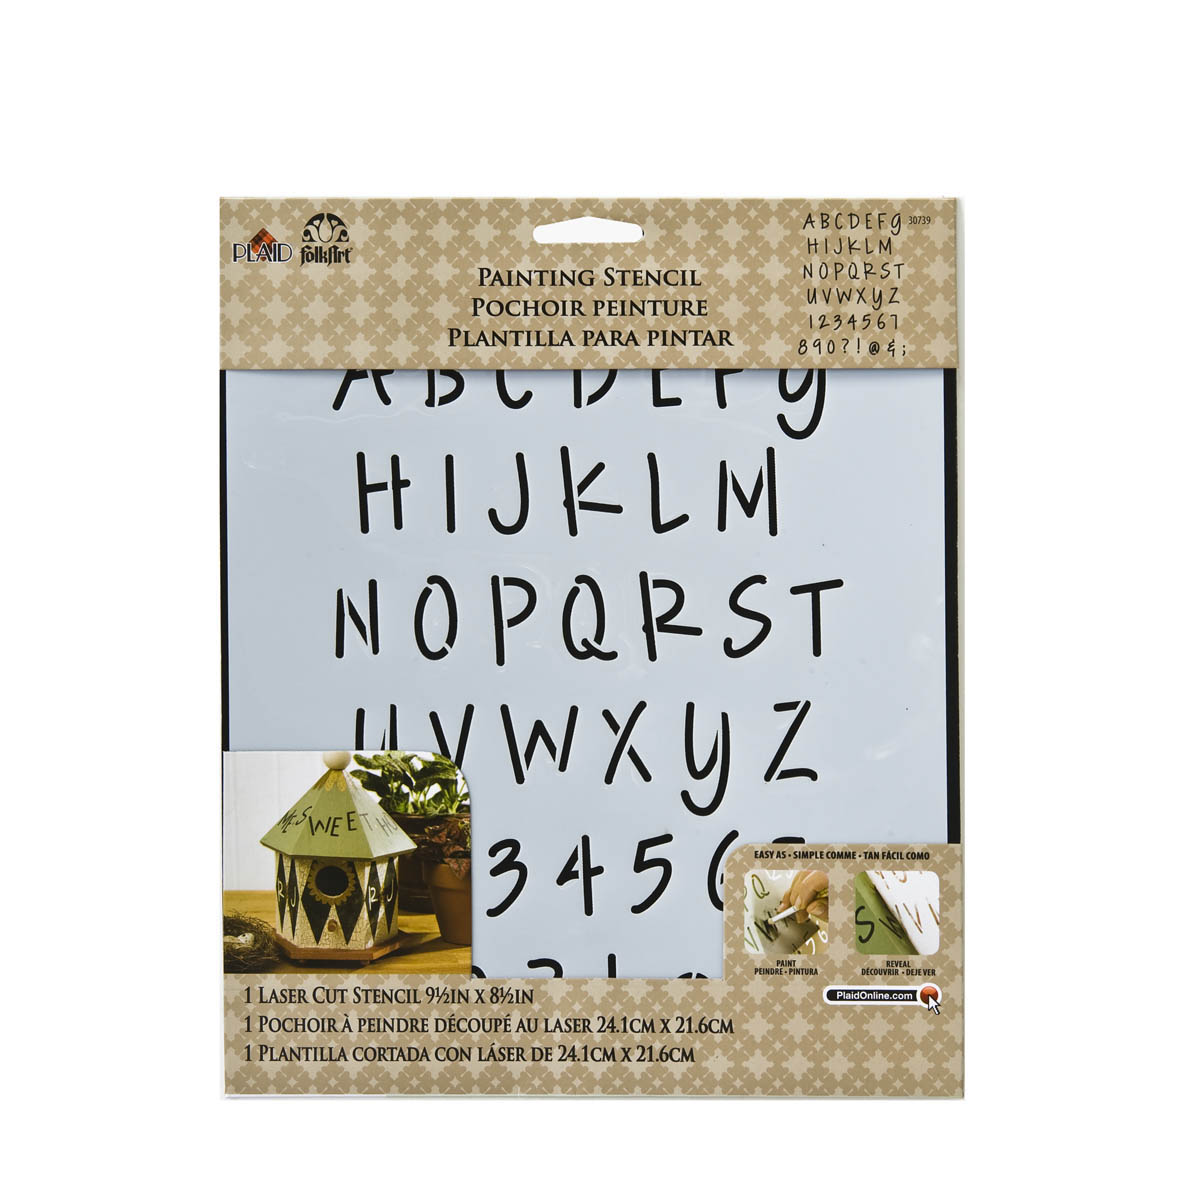 FolkArt ® Painting Stencils - Laser - Alphabet Lite Felt Tip Marker - 30739